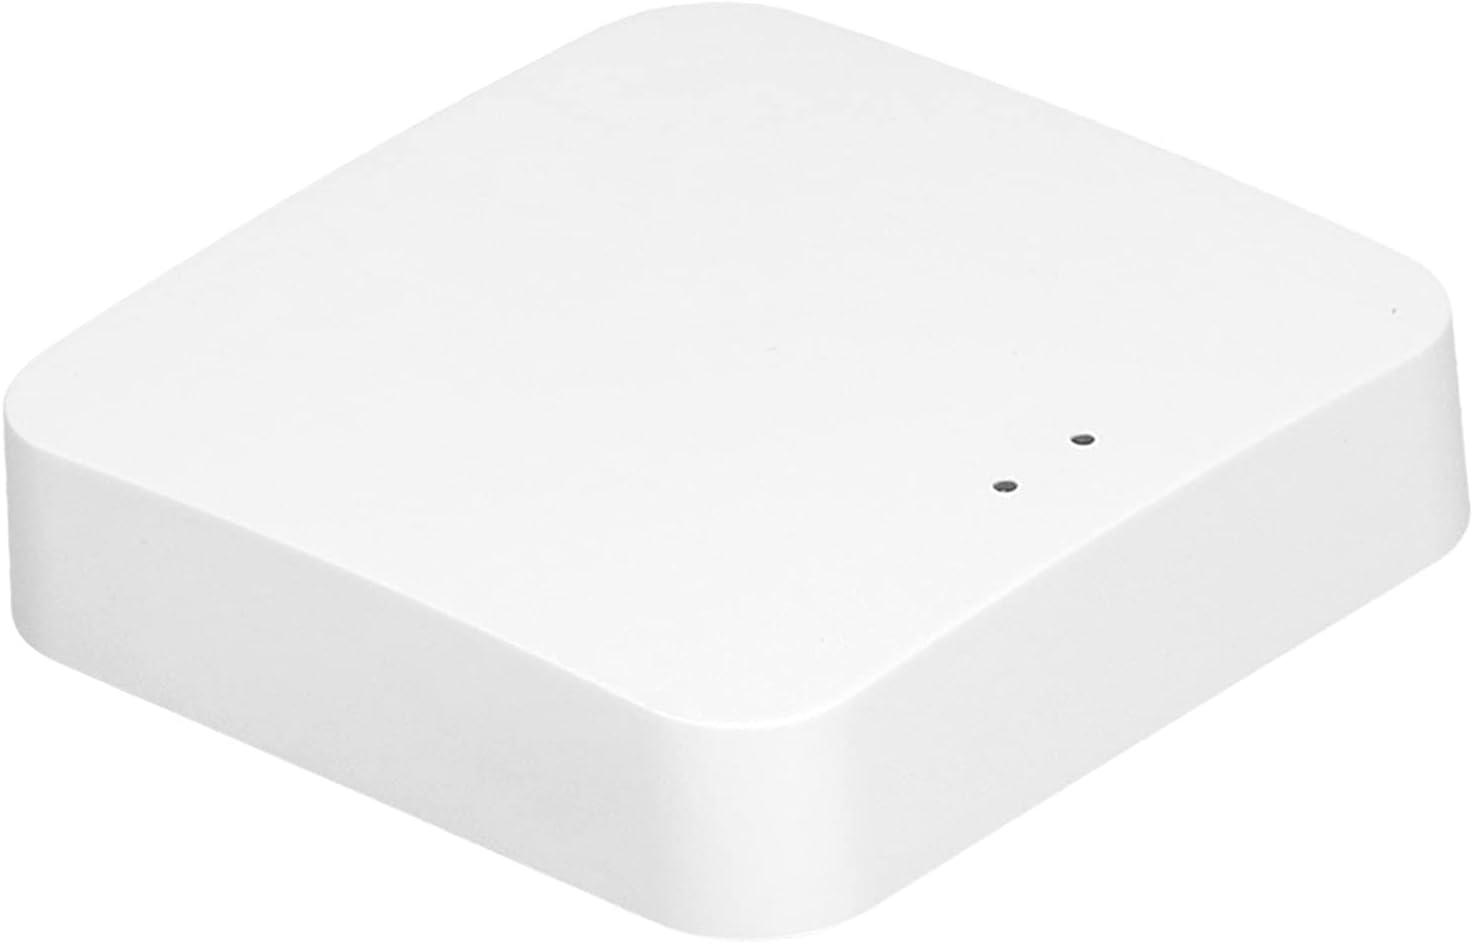 ZigBee Hub, Smart Hub ZigBee 2.0 Gateway Intelligent Wireless Gateway Hub WiFi 802.11 B/g/n AI Voice Control for ZigBee 2.0 for TUYA 5V